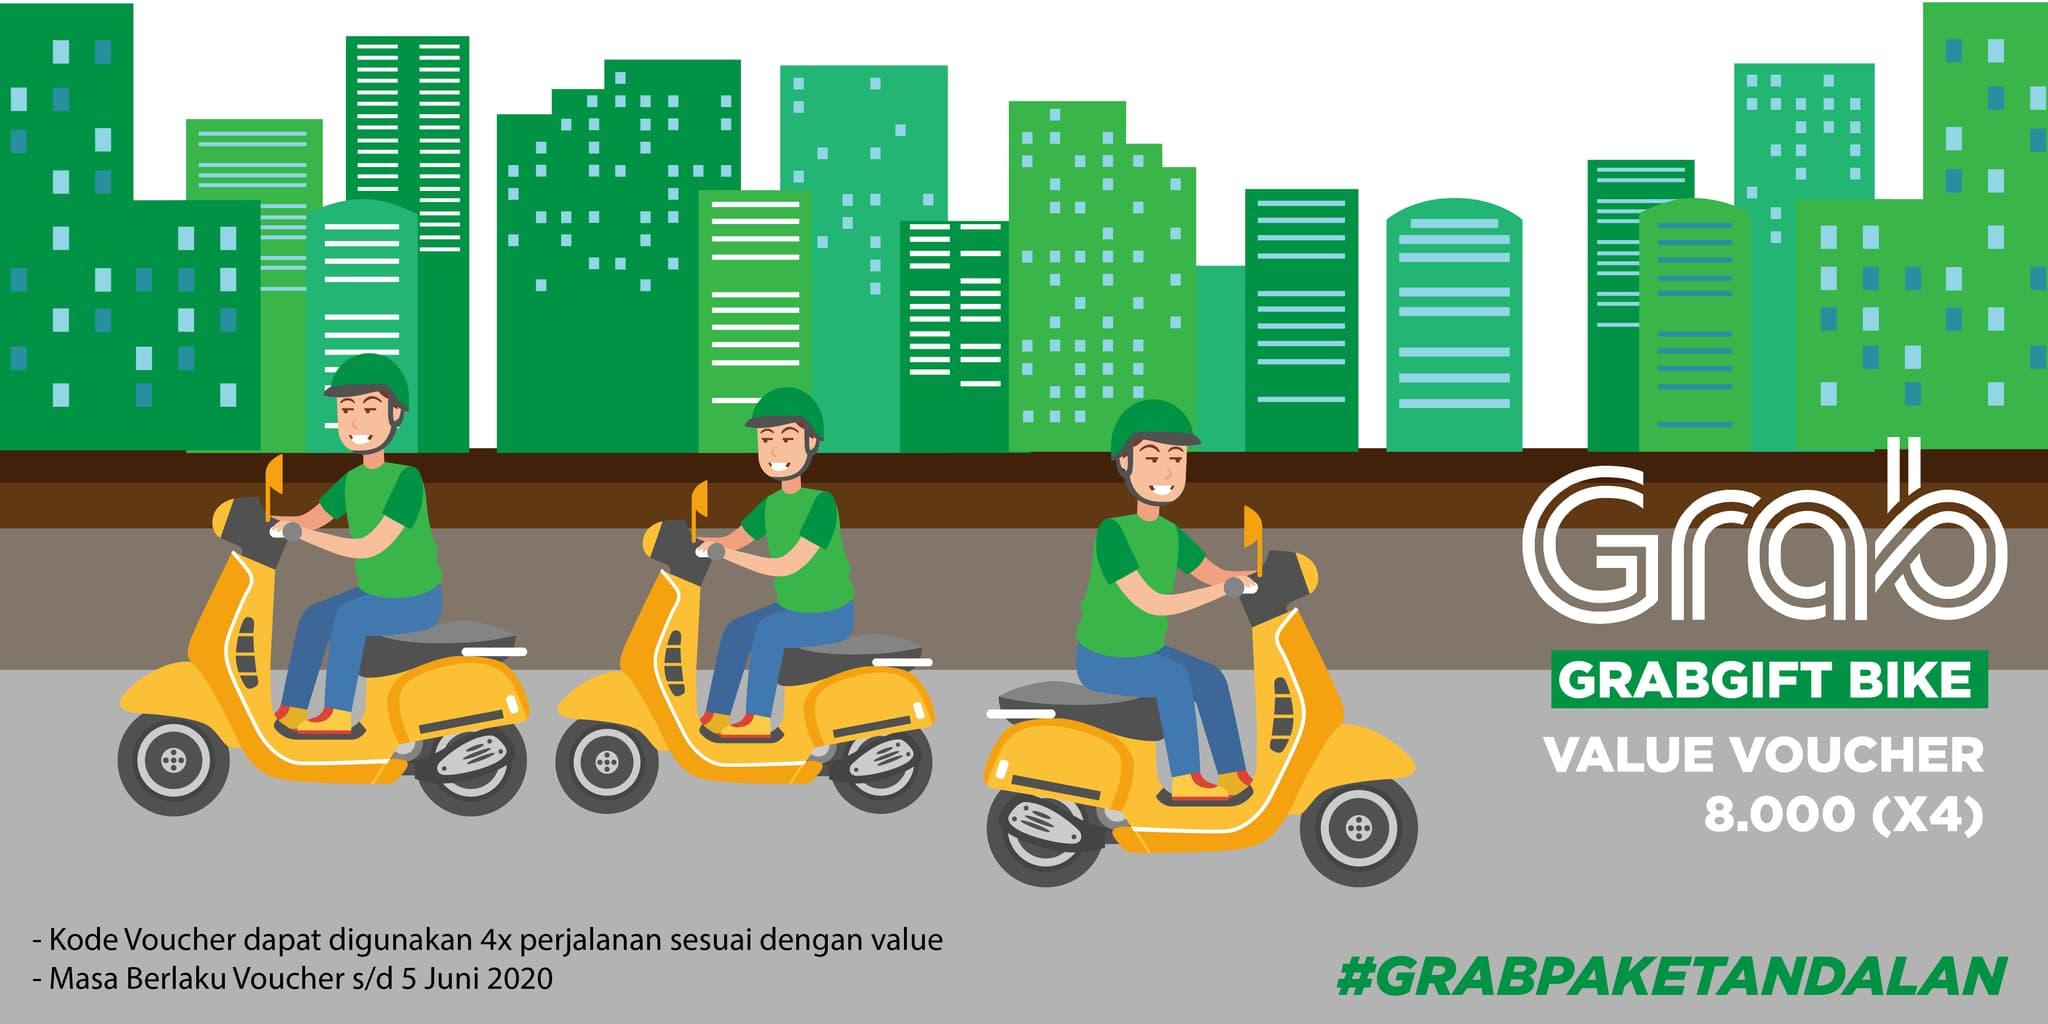 4x Voucher Grab Bike Rp 8.000 (khusus Pengguna Aplikasi Grab)